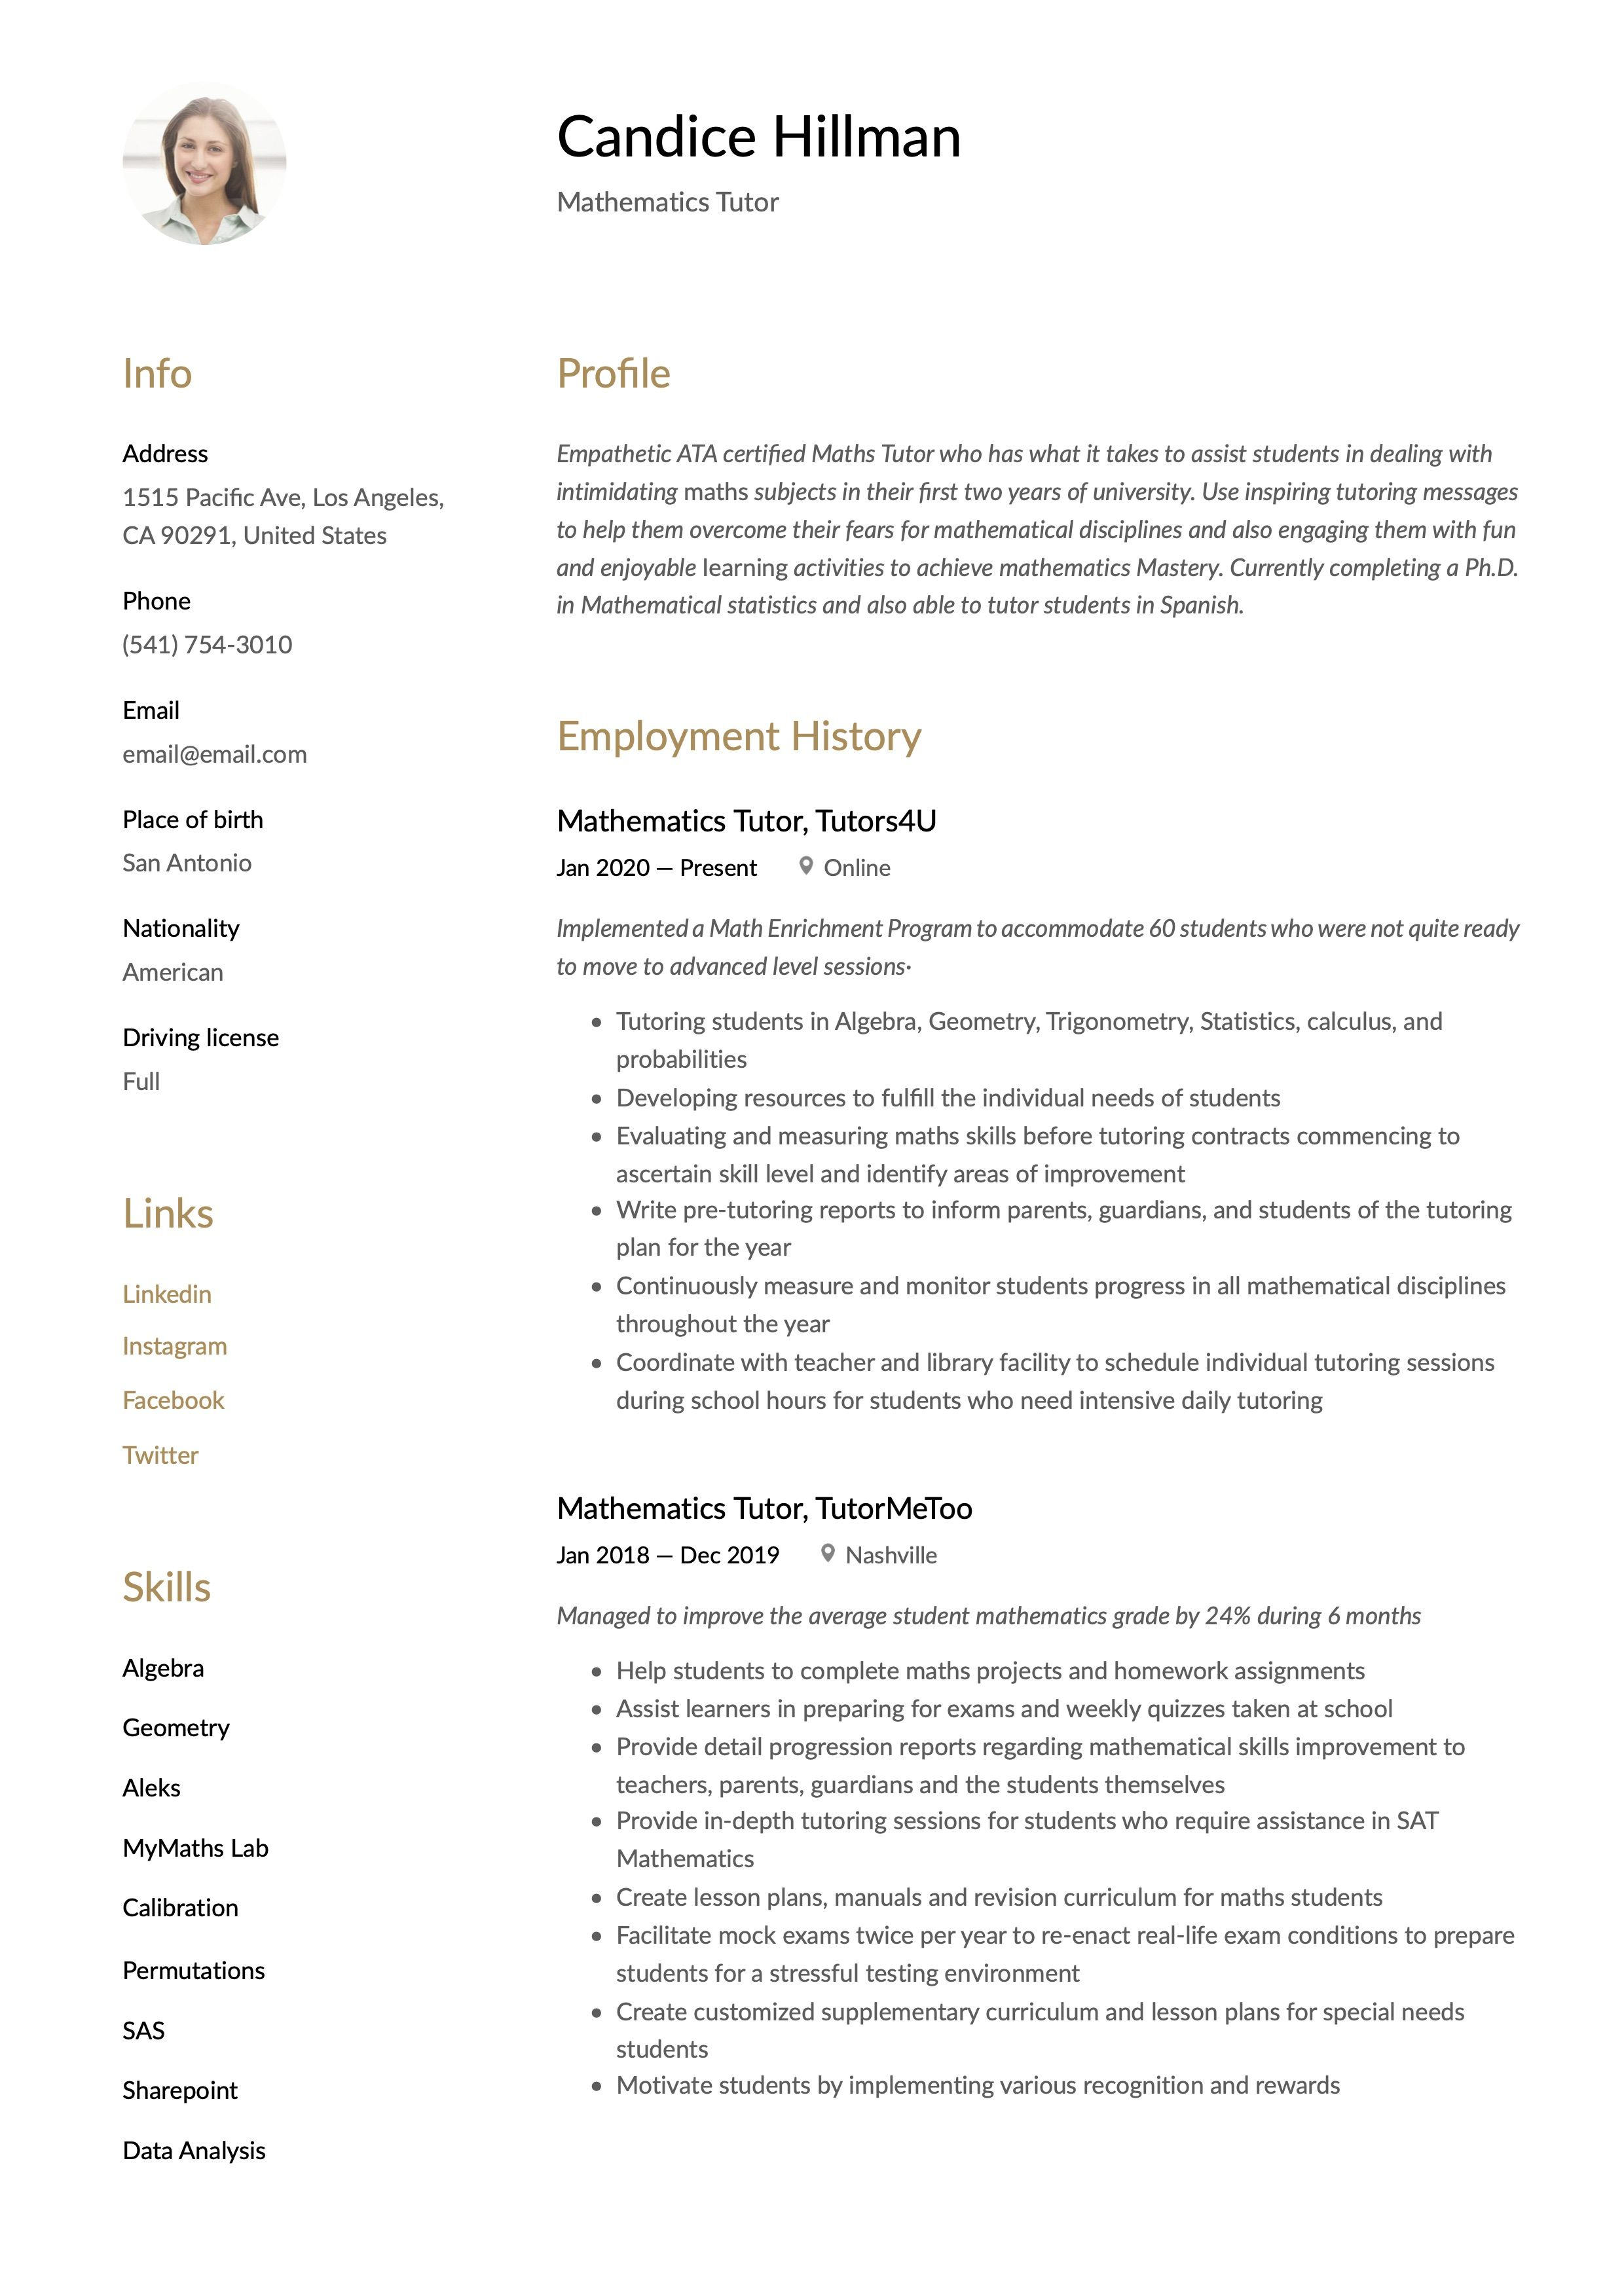 Mathematics Tutor Resume Template Mathematics Guided Writing Resume Writing